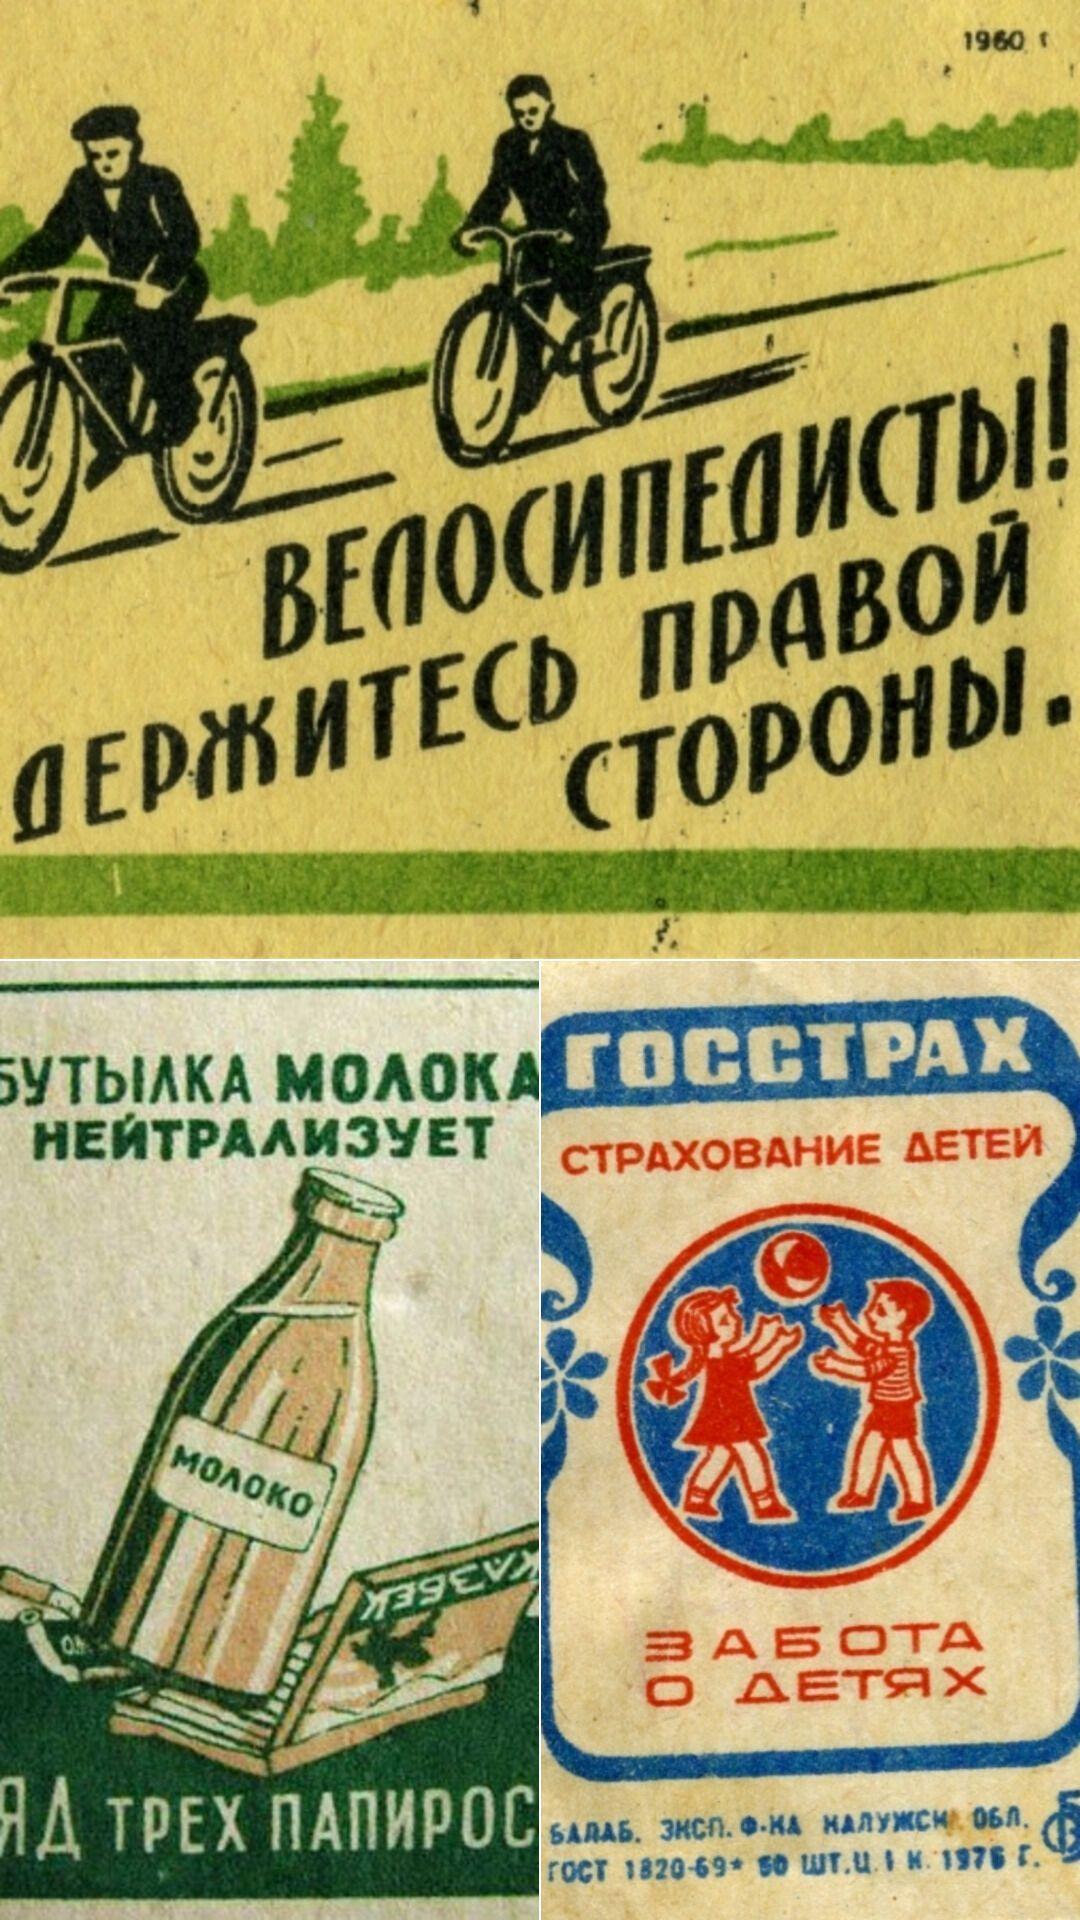 Реклама на советских спичках.